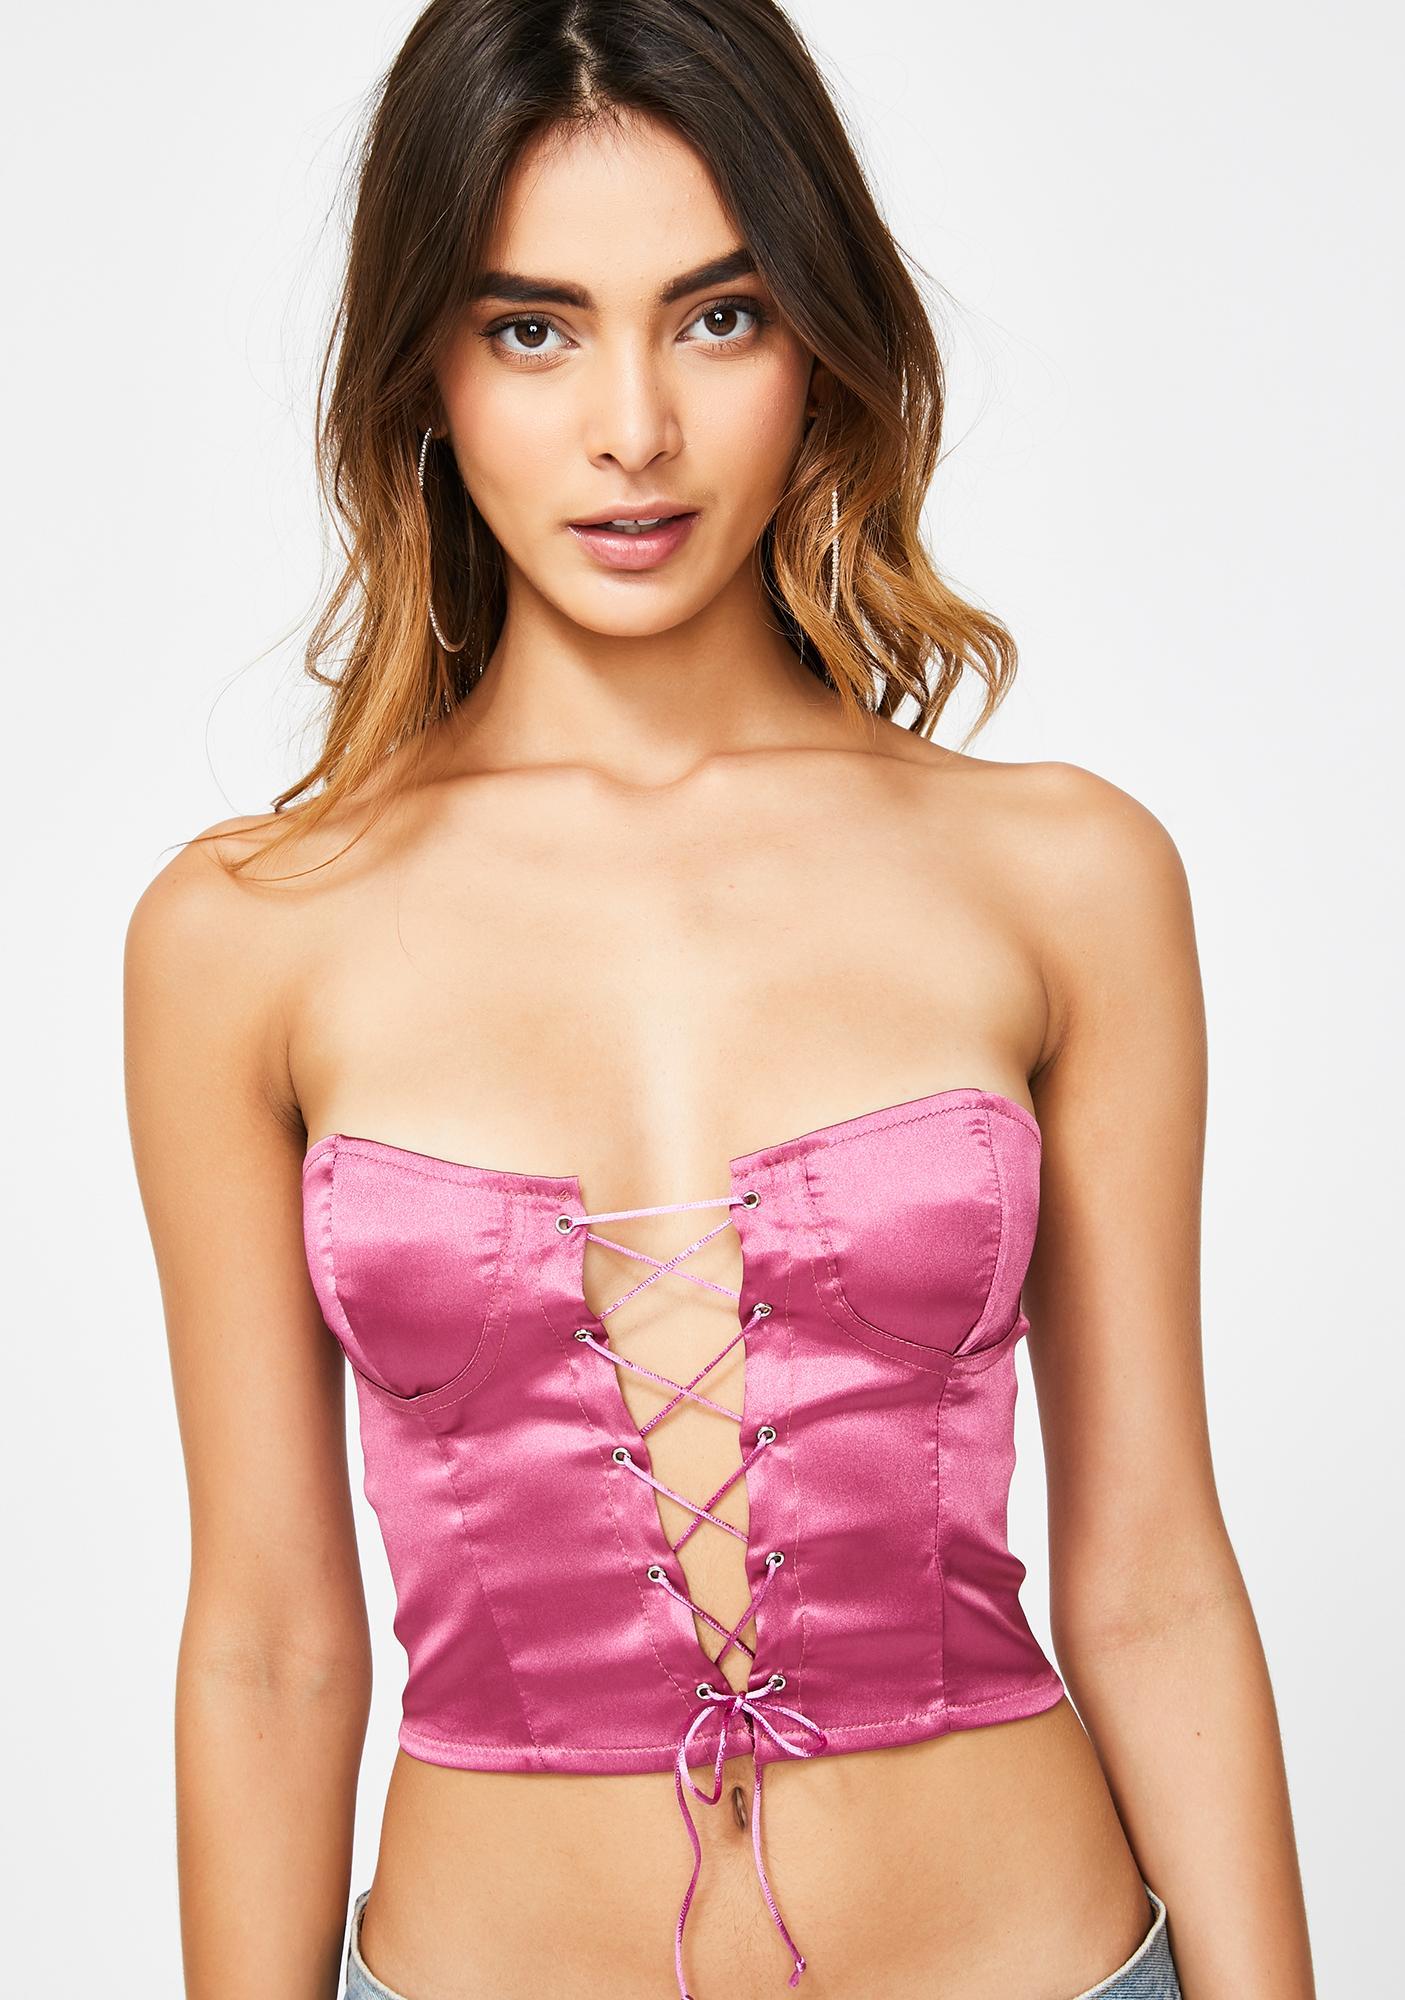 ZEMETA Pink Lace Up Bustier